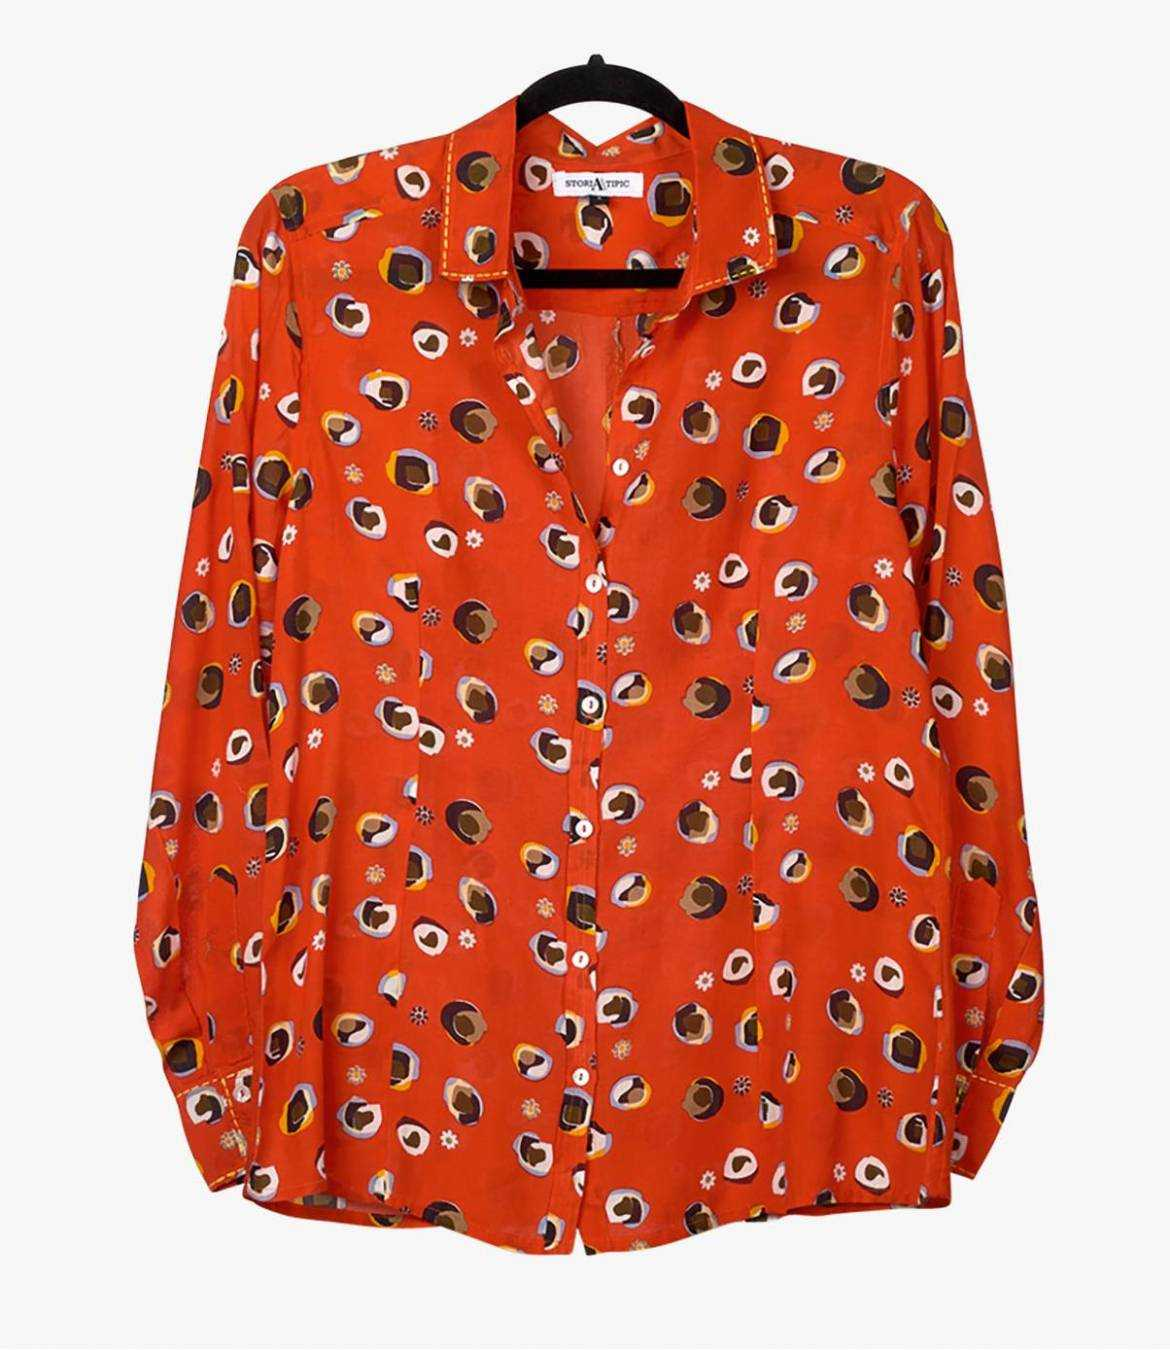 BONI BULLE Women's Modal Shirt Storiatipic - 2